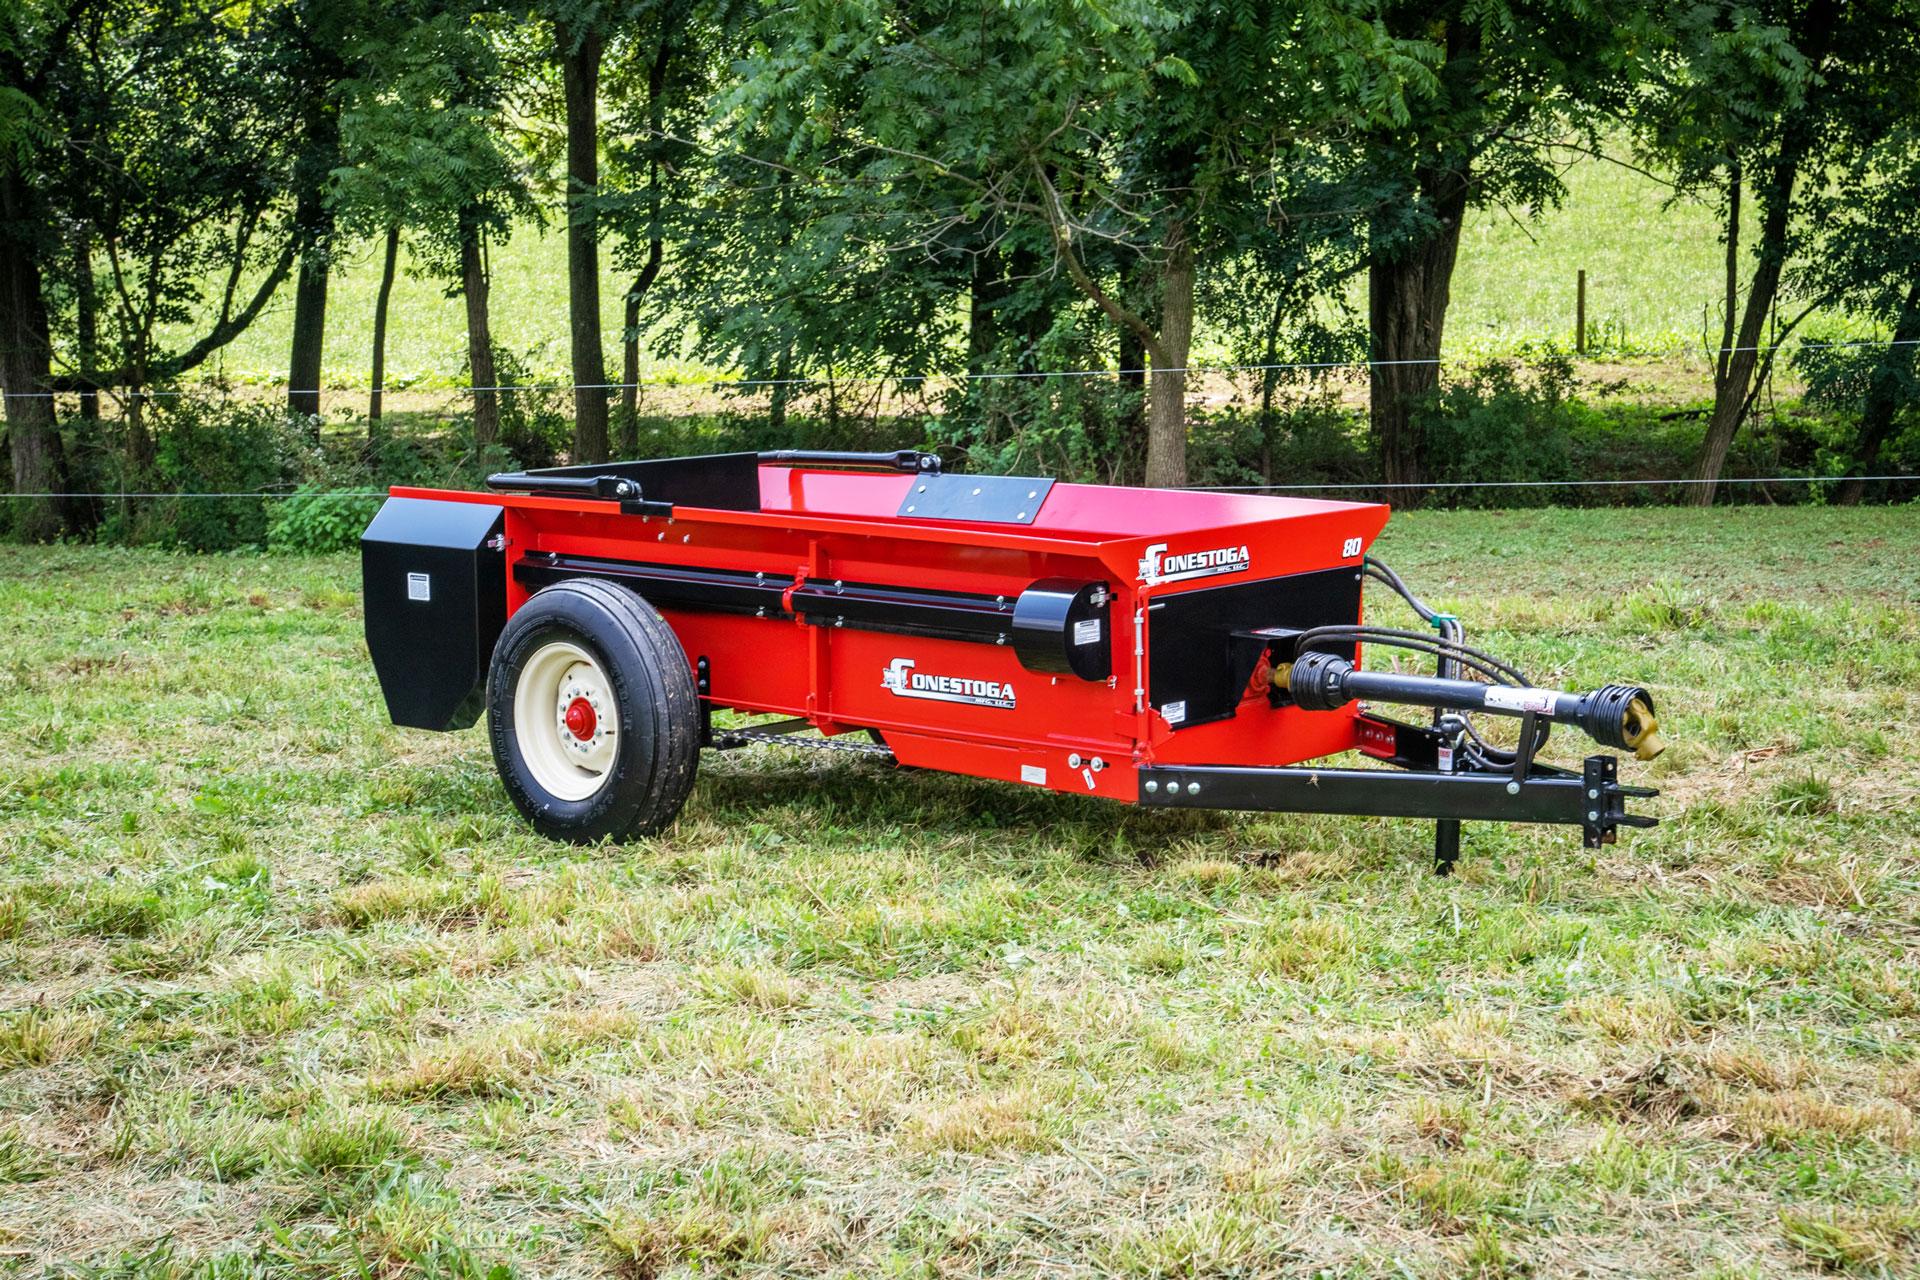 Medium manure spreader with PTO drive from conestoga manure spreaders.